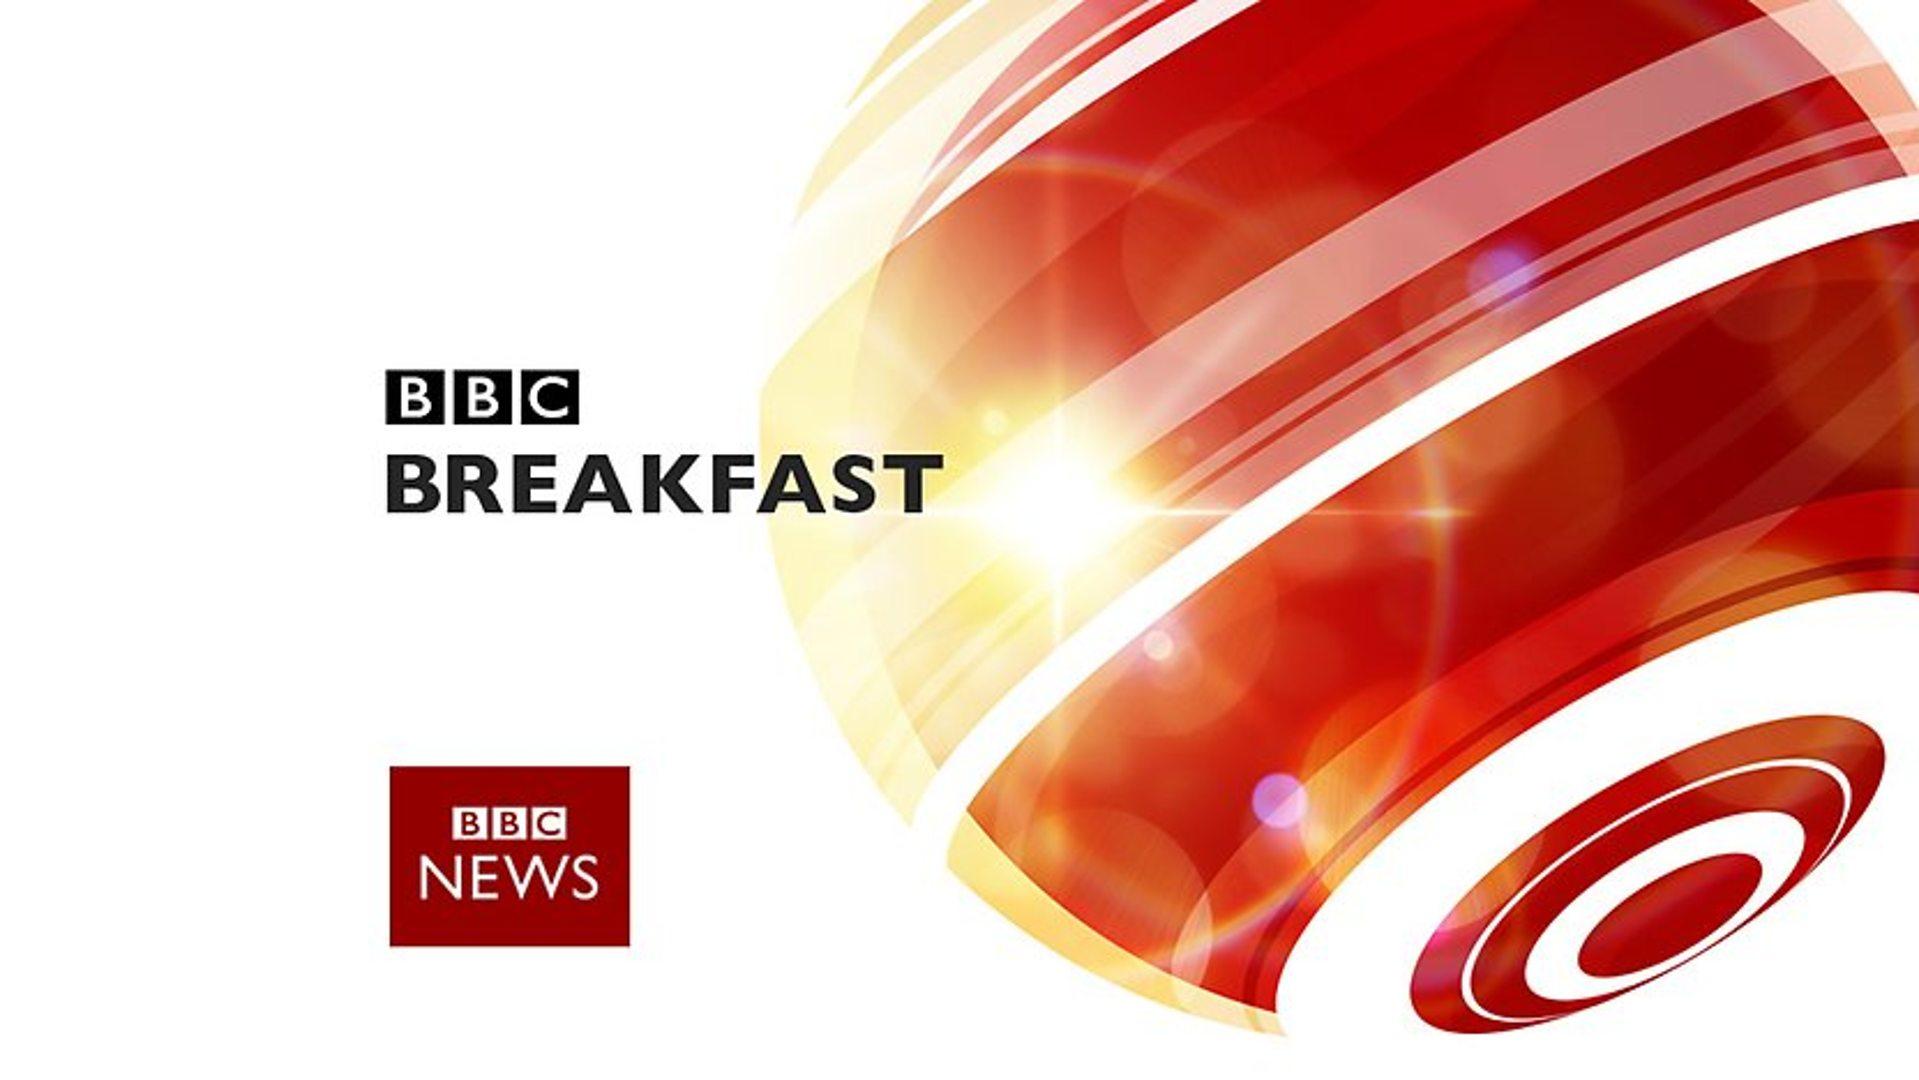 bbc break.jpg